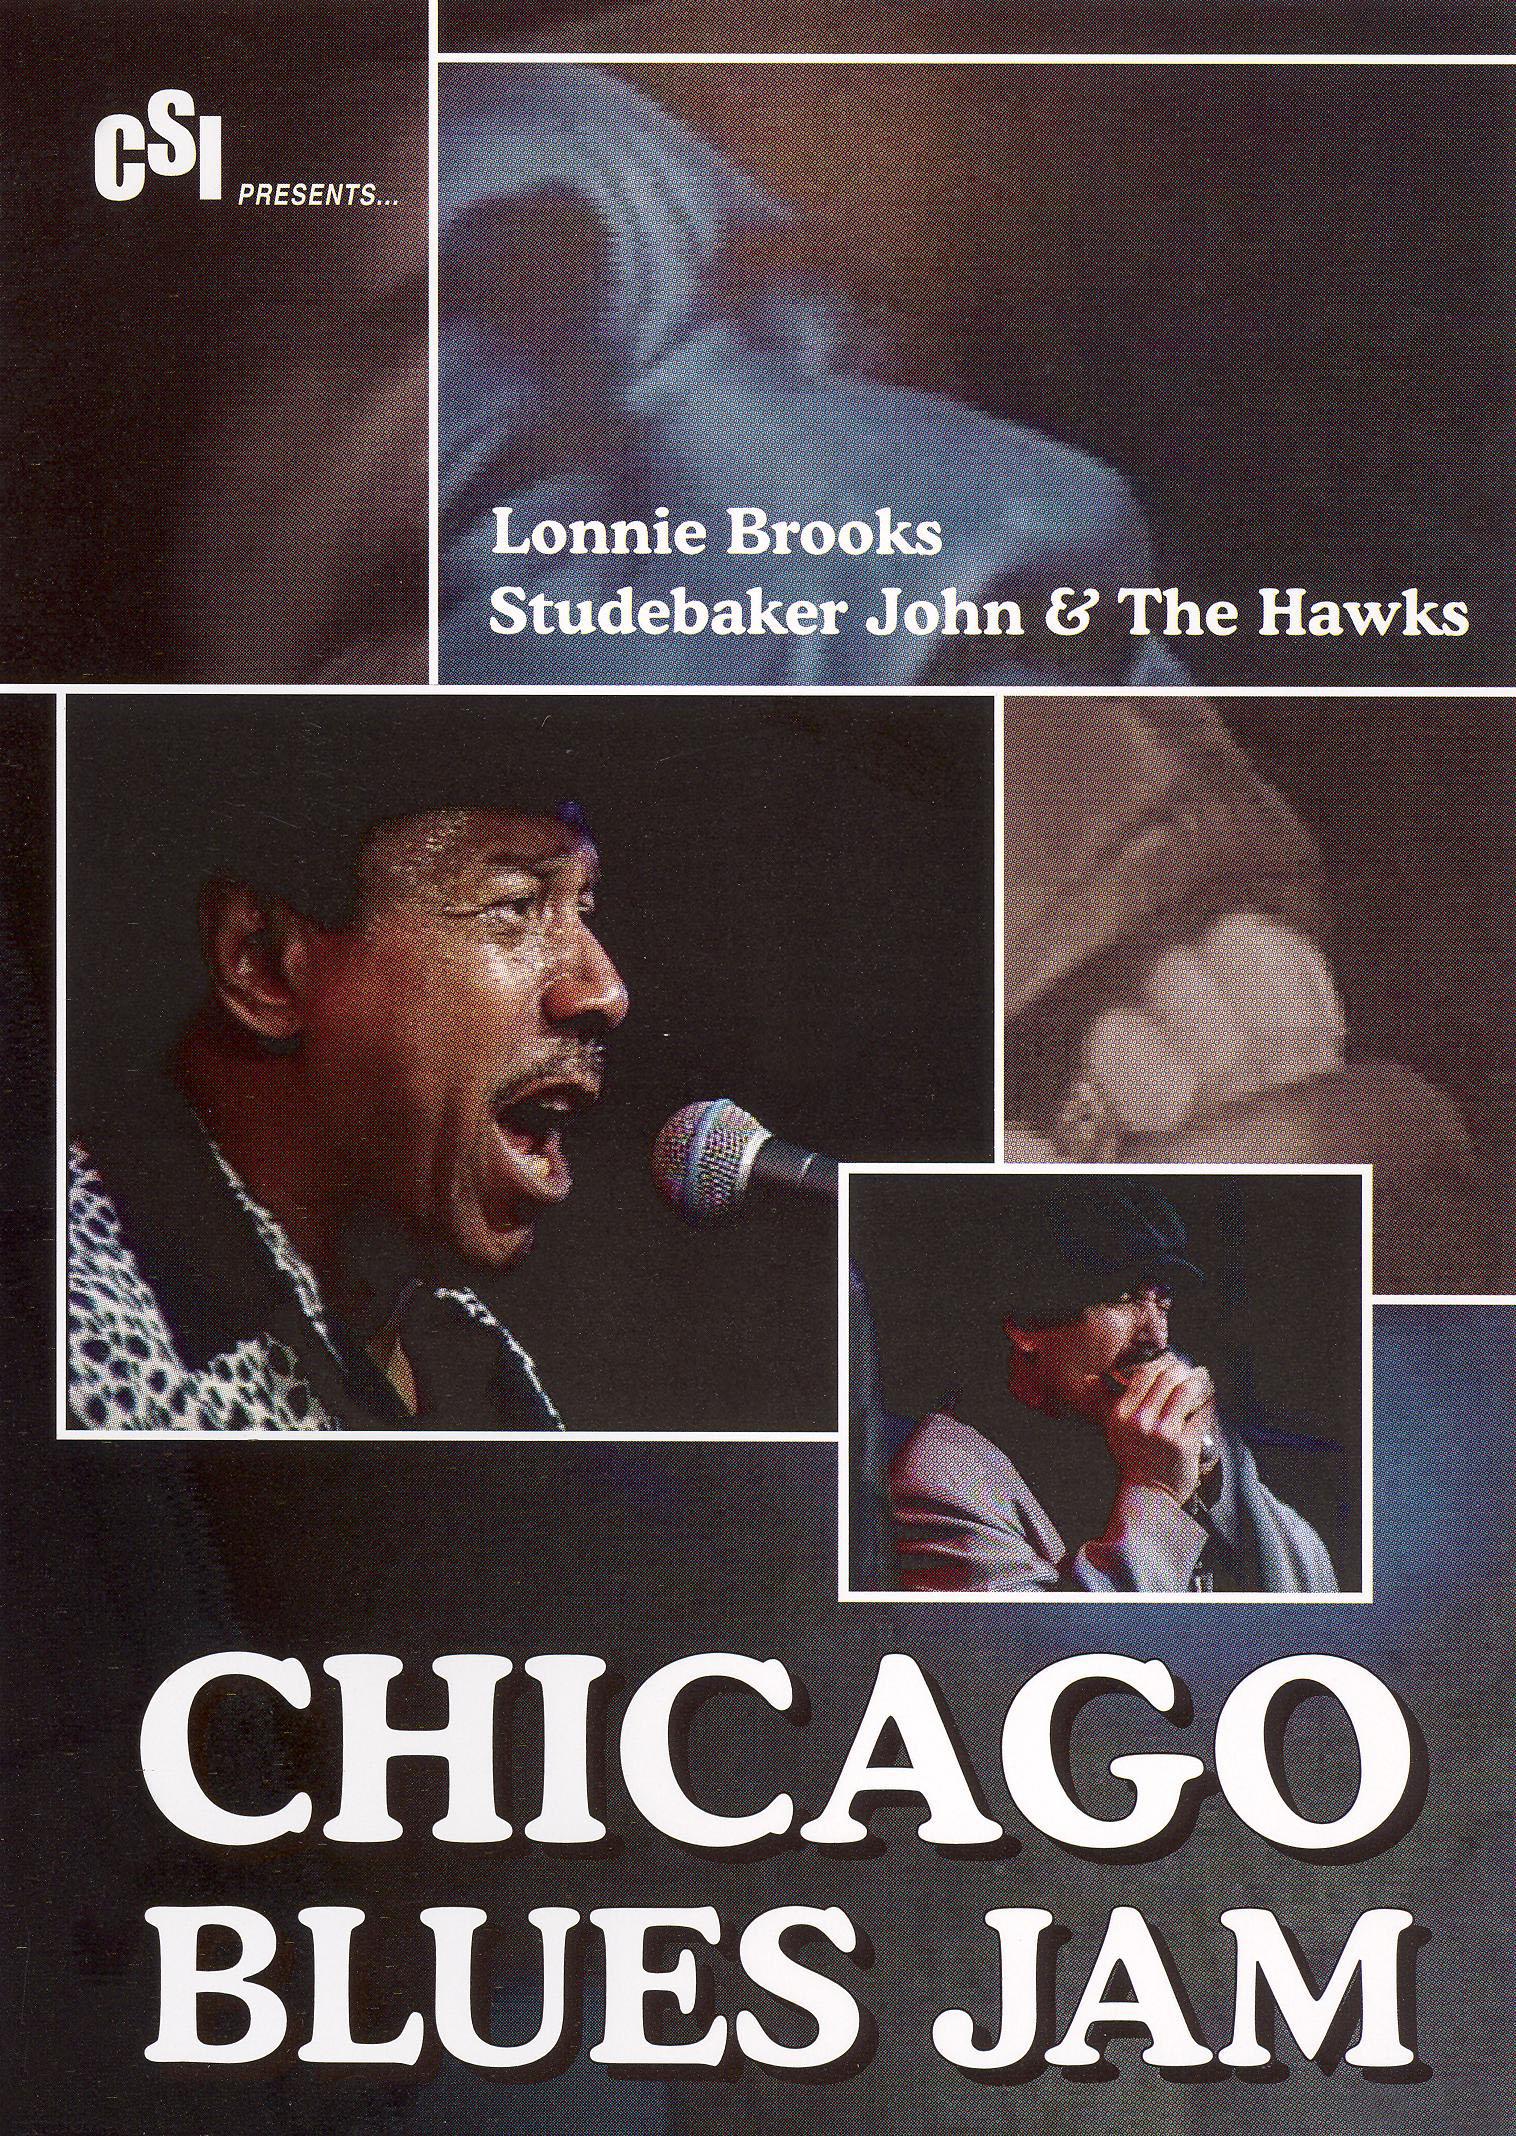 Chicago Blues Jam: Lonnie Brooks/Studebaker John